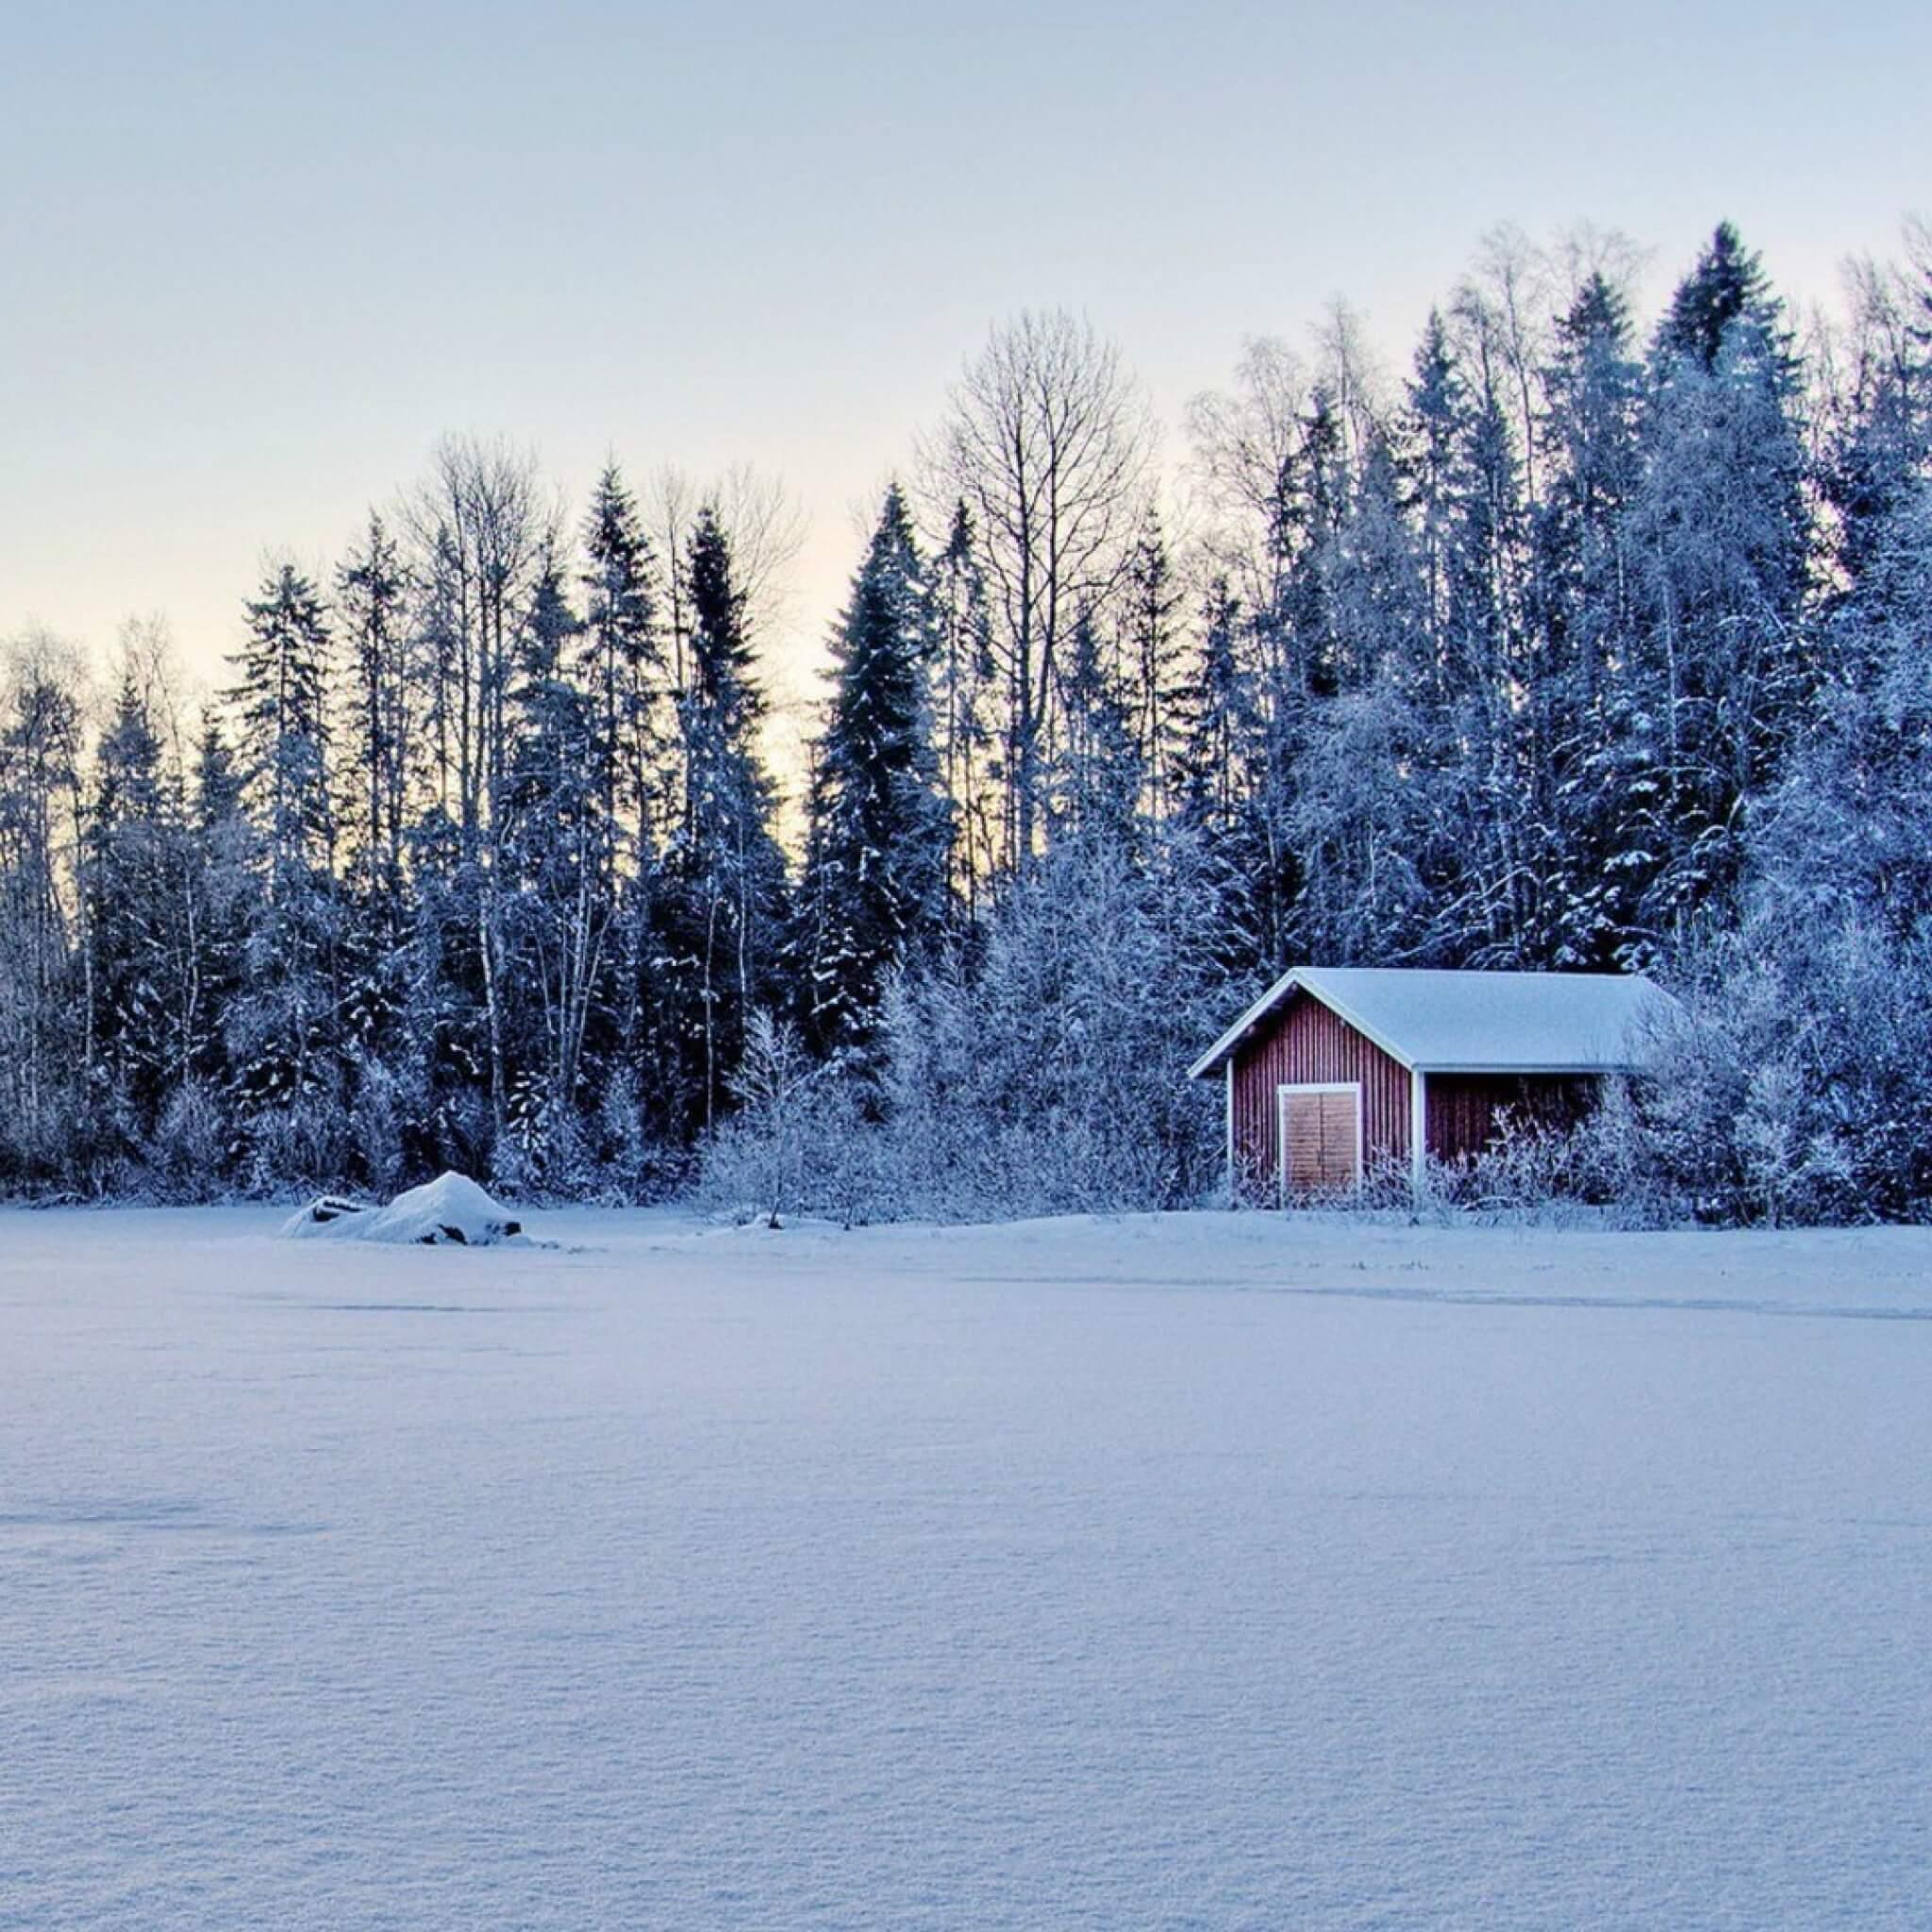 snow_field_trees_buildings_84824_2048x2048